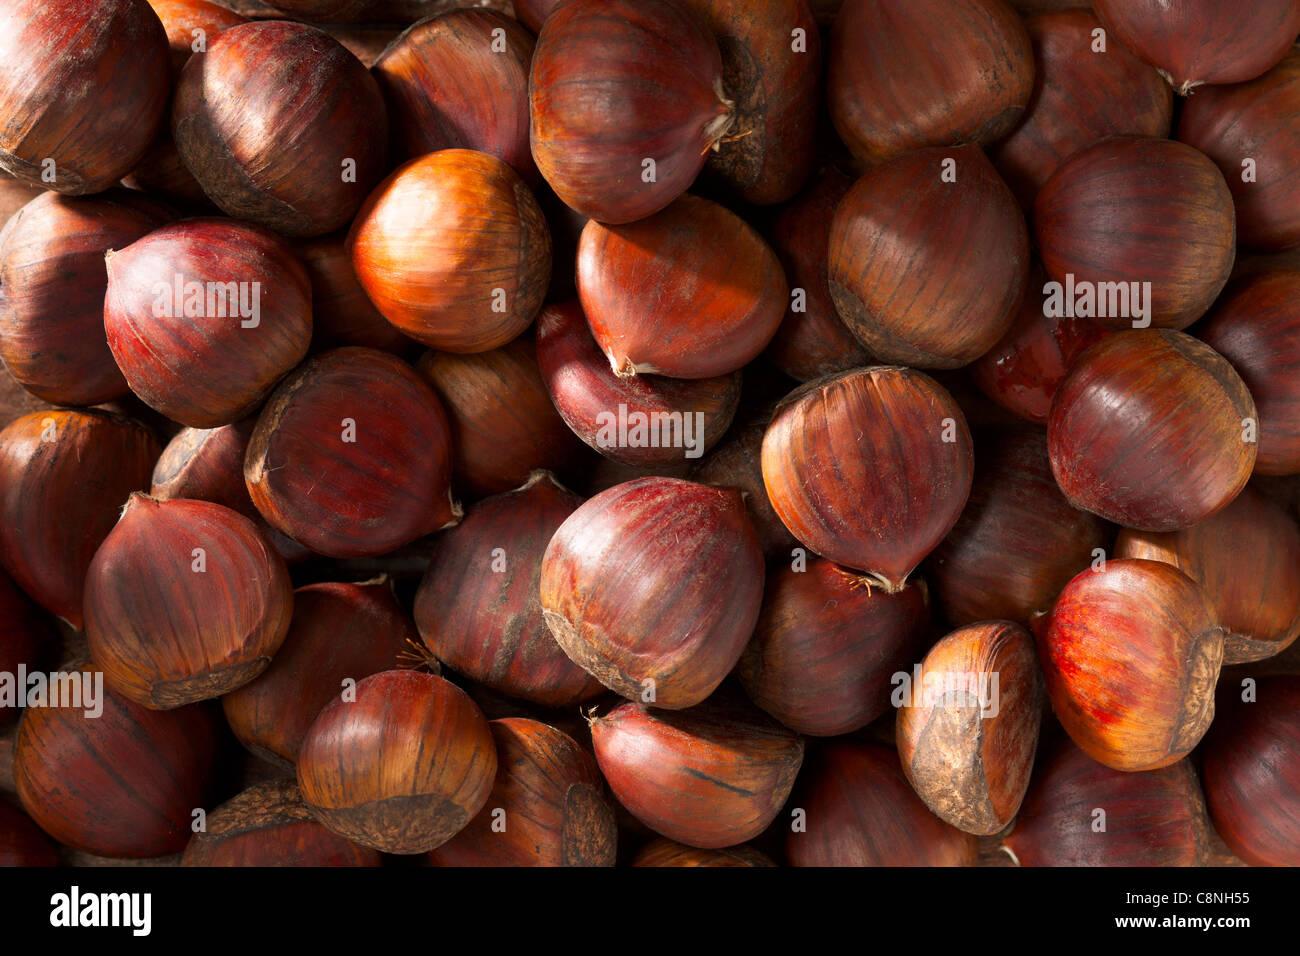 Many Chestnuts, Full Frame - Stock Image